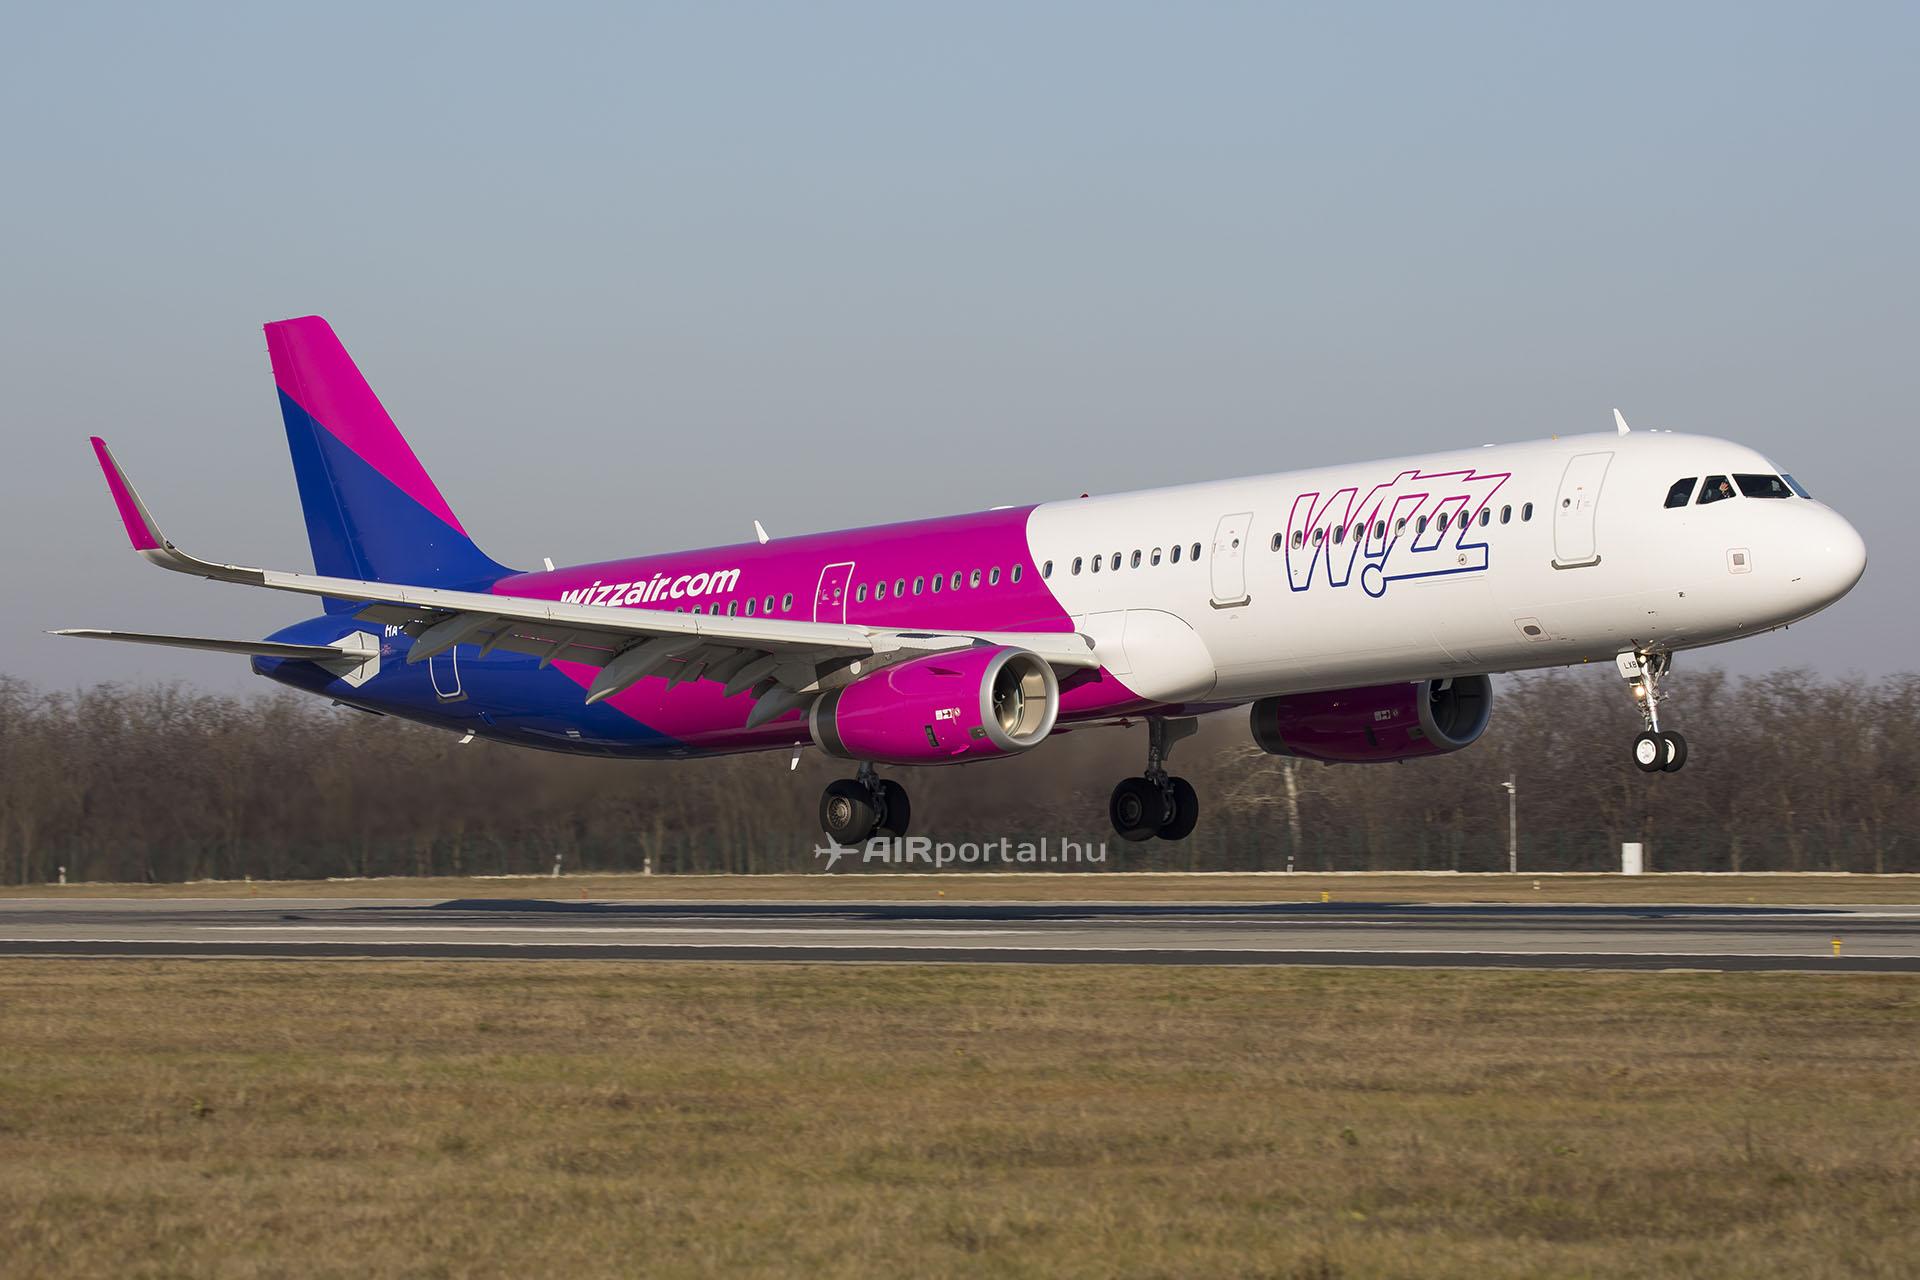 A Wizz Air Airbus A321-es repülőgépe Budapesten. (Fotó: AIRportal.hu)   © AIRportal.hu